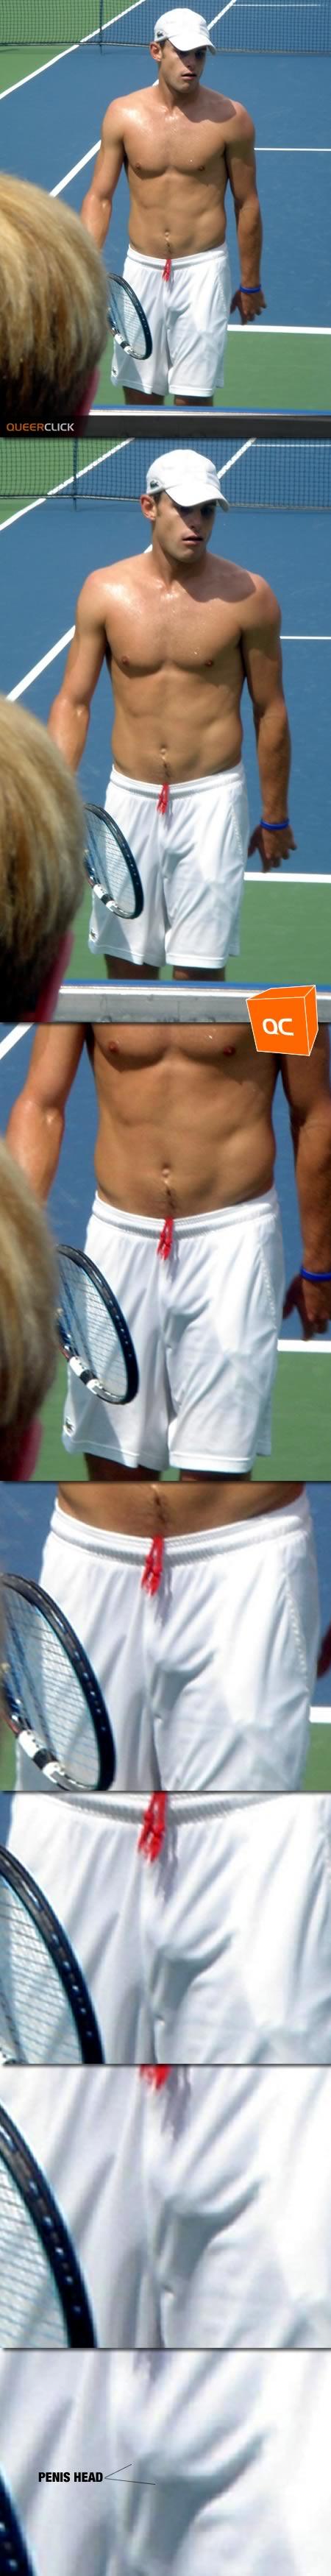 andy-roddick-bulge.jpg